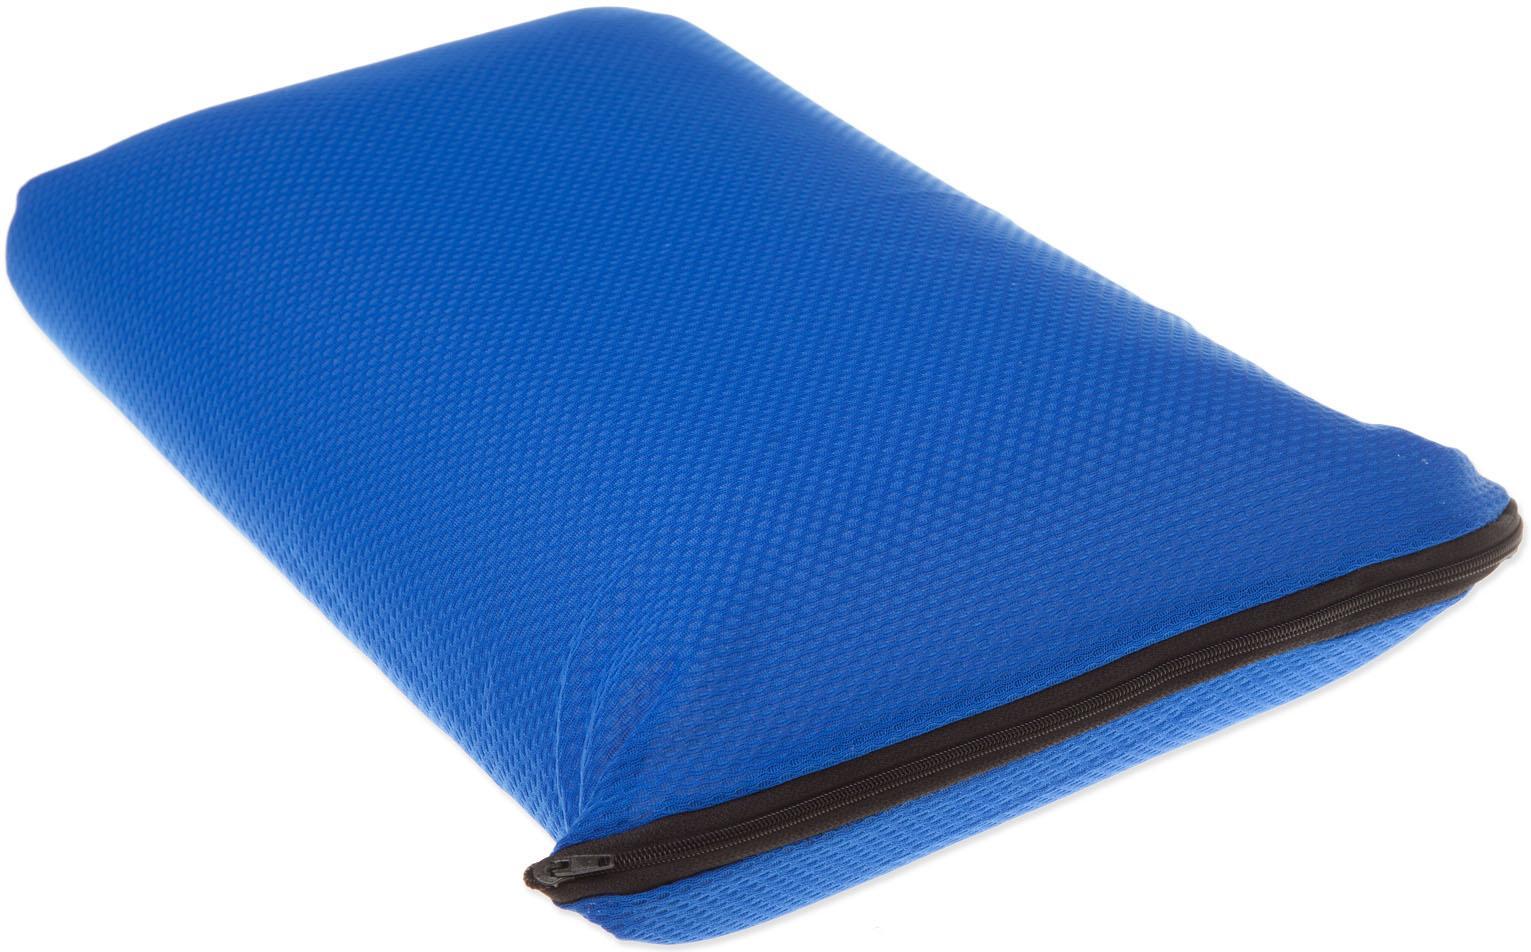 Jekatex Reisekissen 42x24cm, (1 tlg.) blau Nackenkissen Kissen